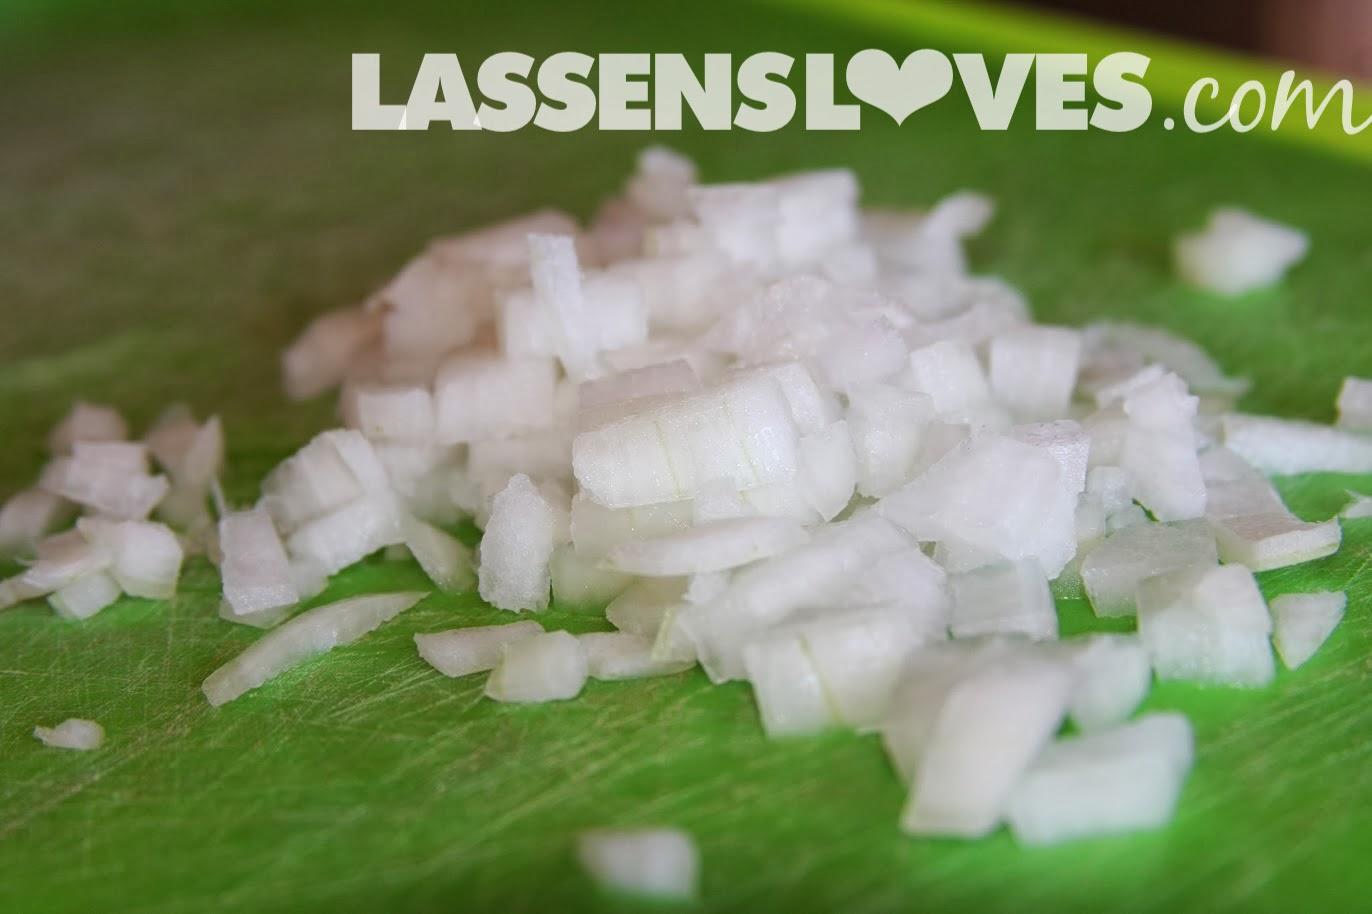 lassensloves.com, Lassen's, Lassens, hamburger+stroganoff